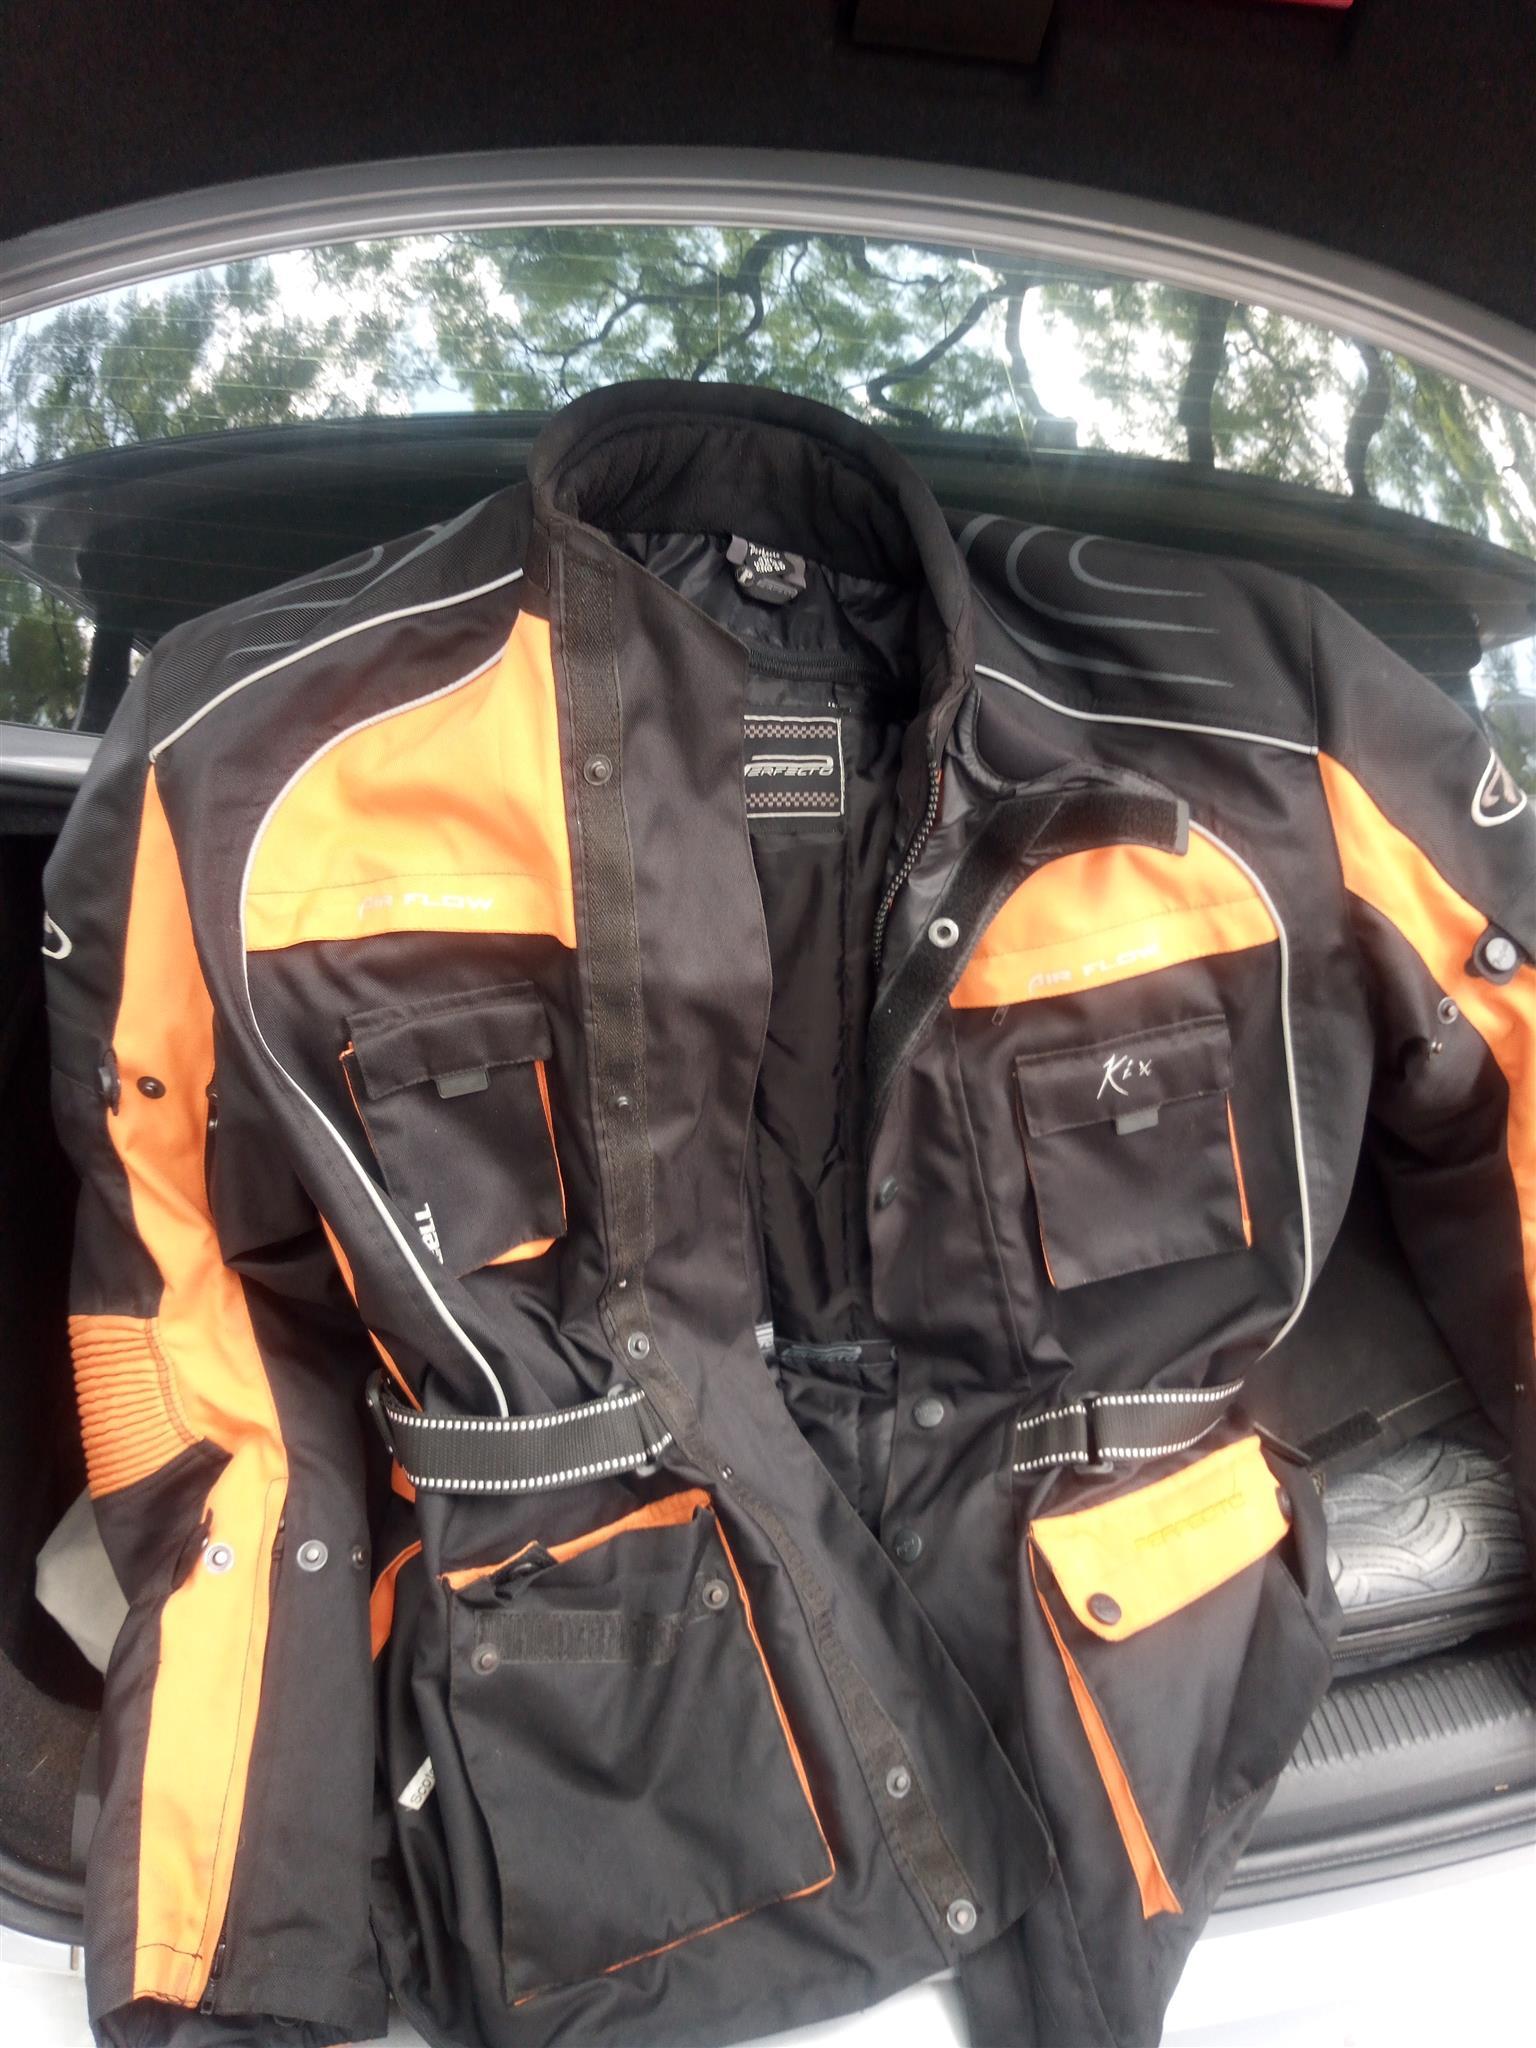 Protecta KTM type biker jacket with matching pants1